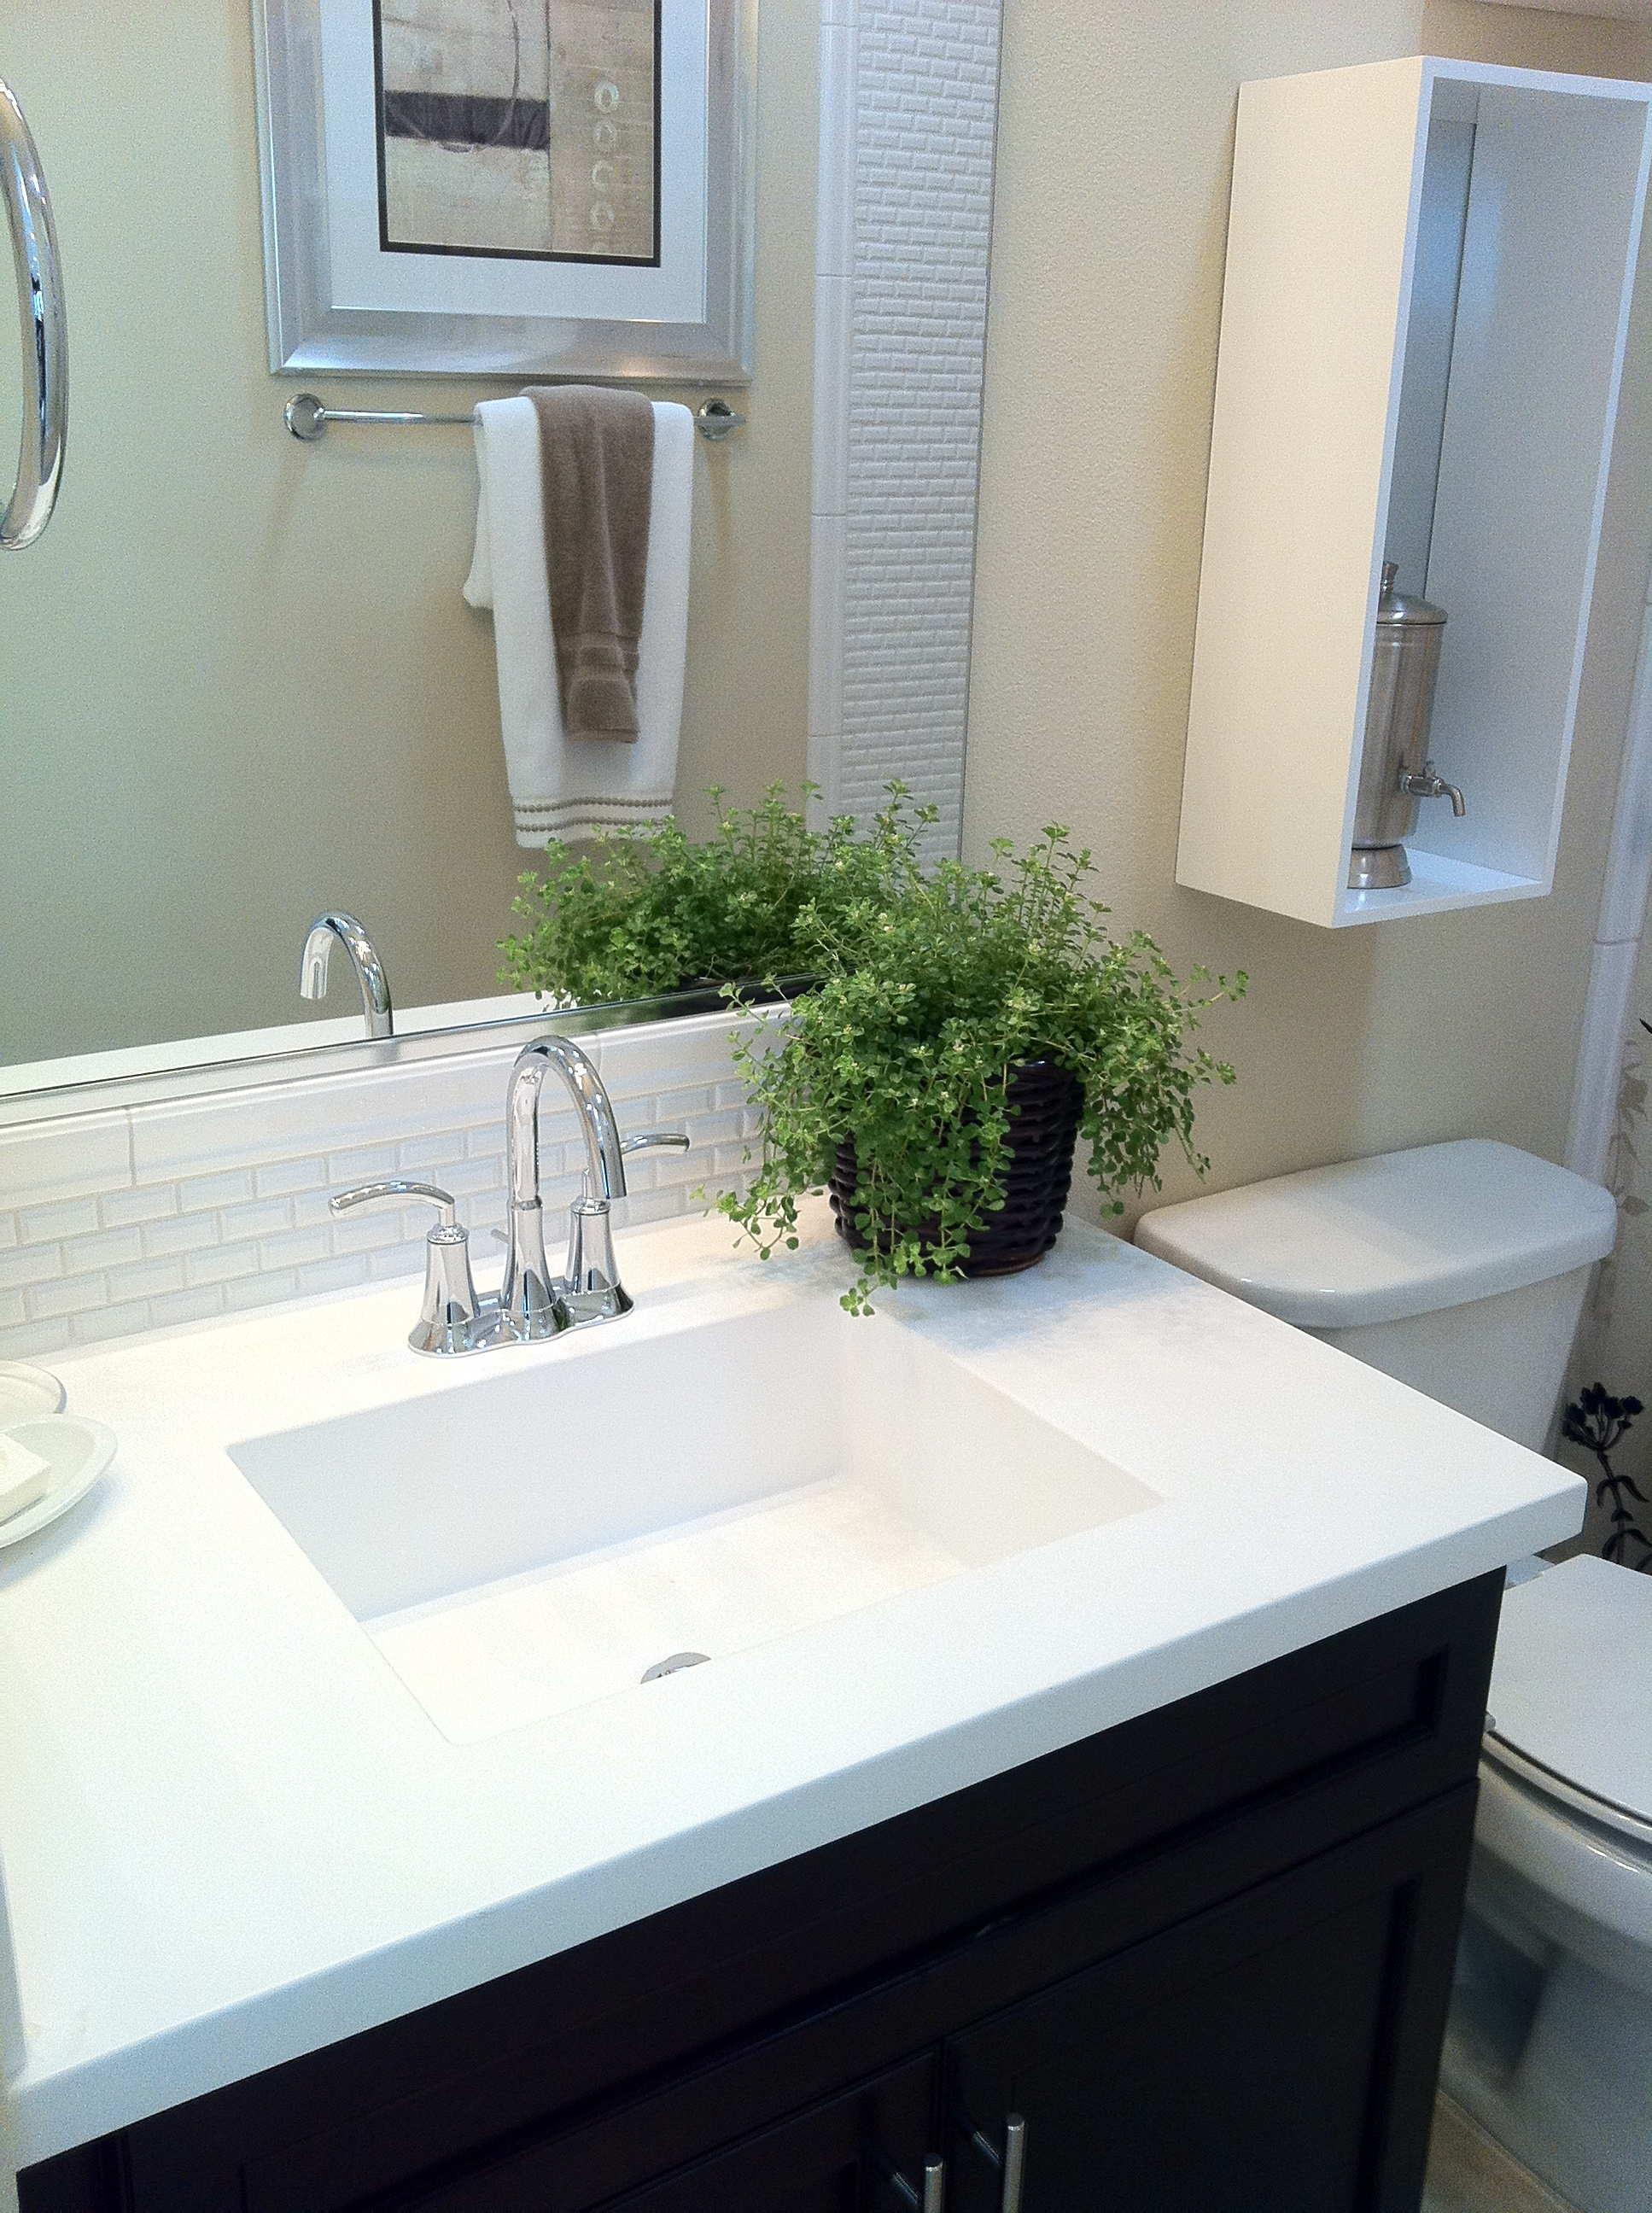 Bathroom Sink Dreamy Person Best Of Corian Bathroom Sinks